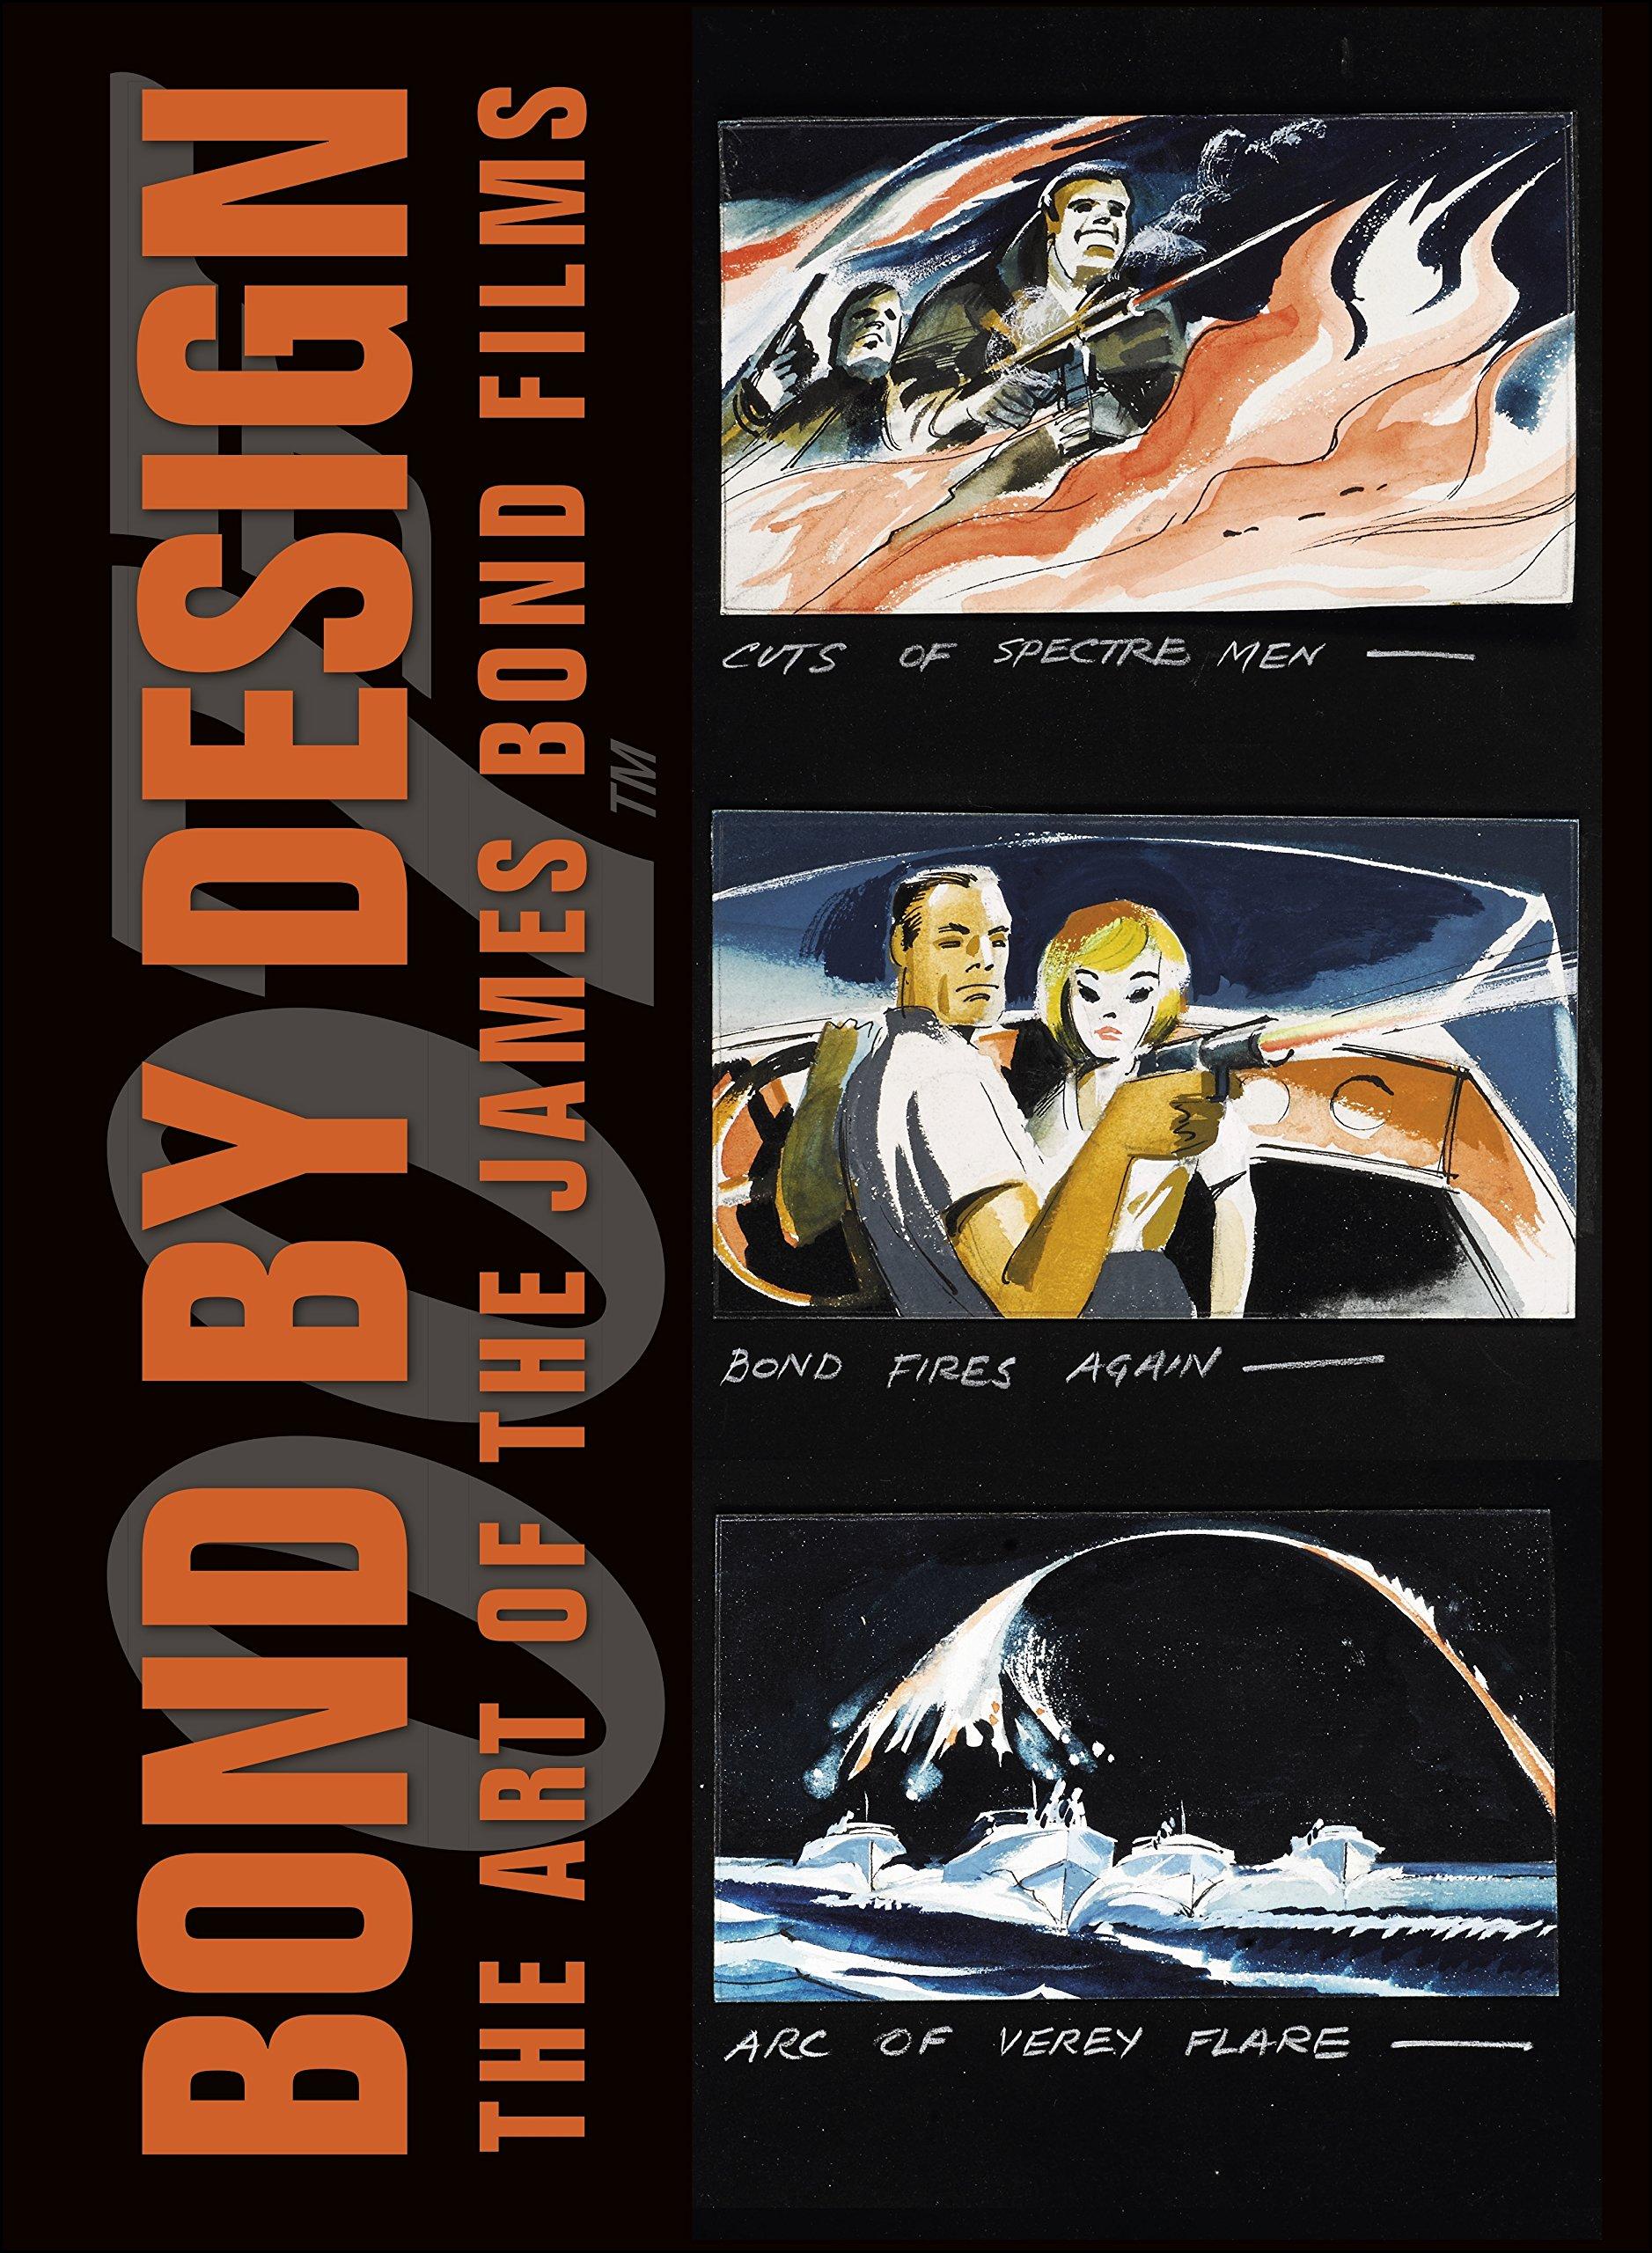 Fire bond adventures artwork